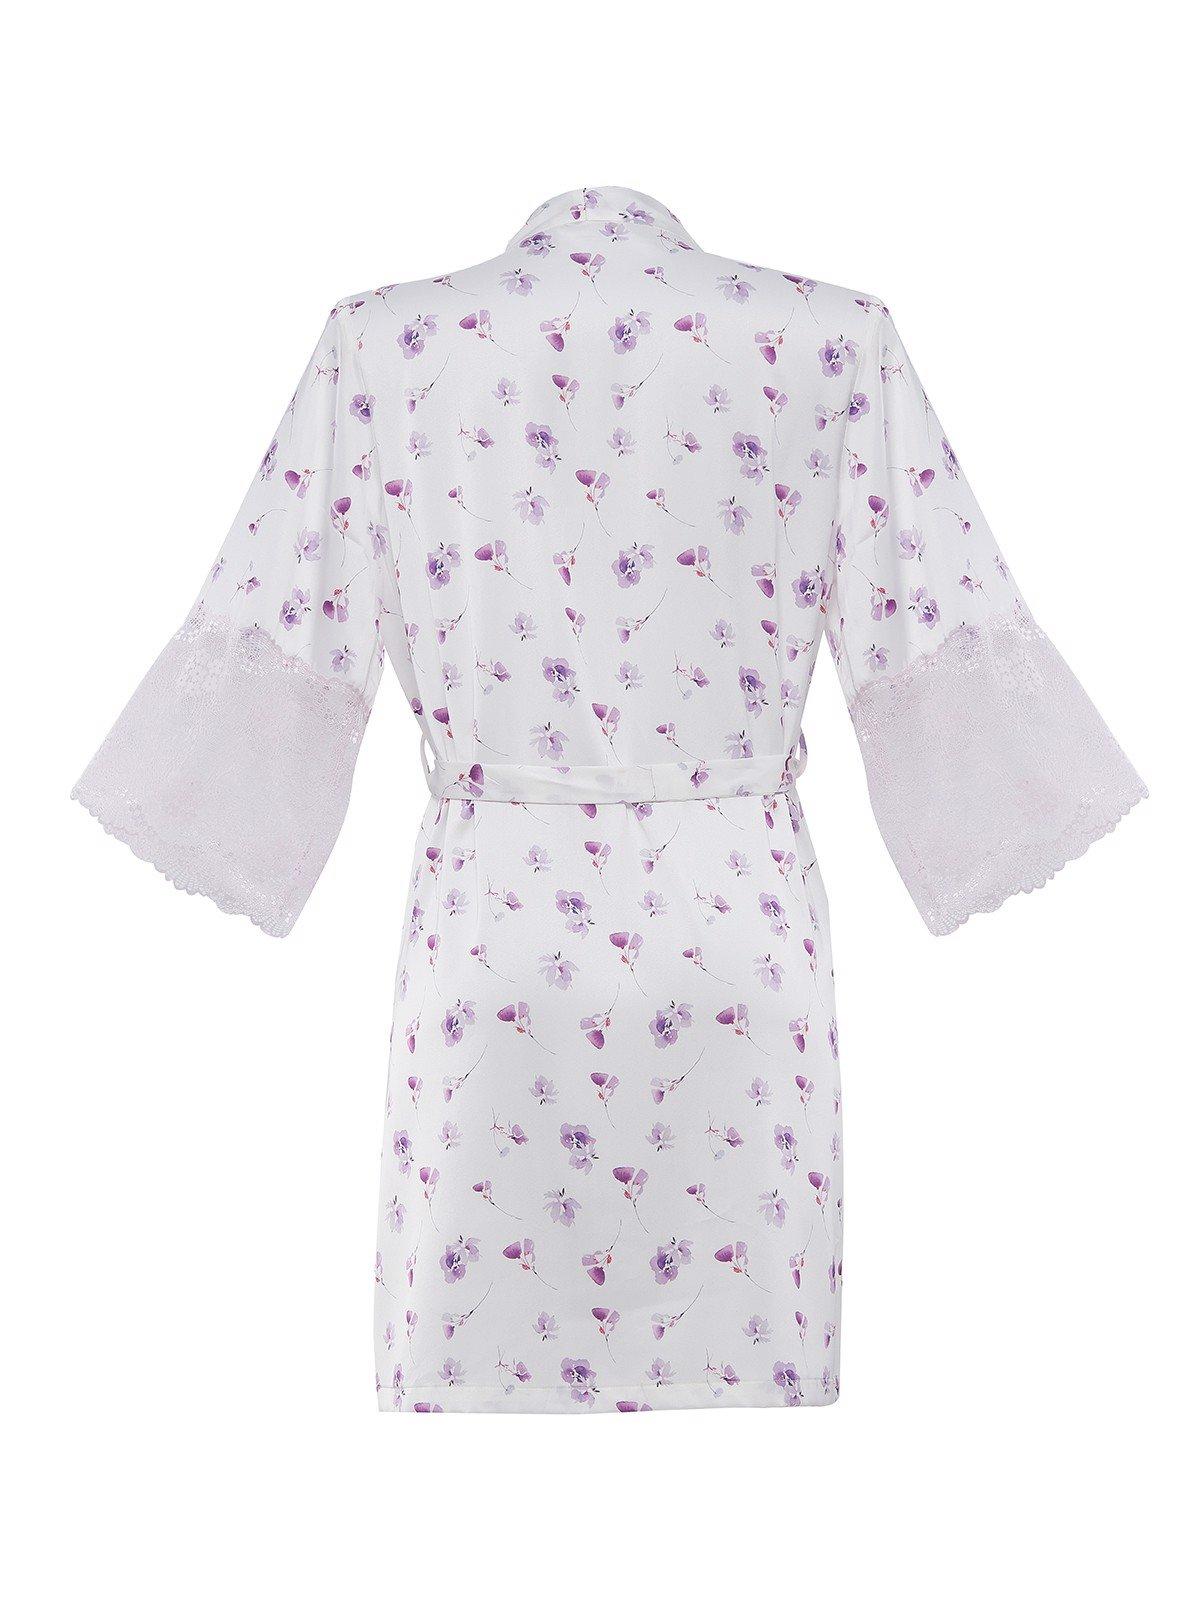 Kimono VERA satin phối ren Misty Florals - 0148